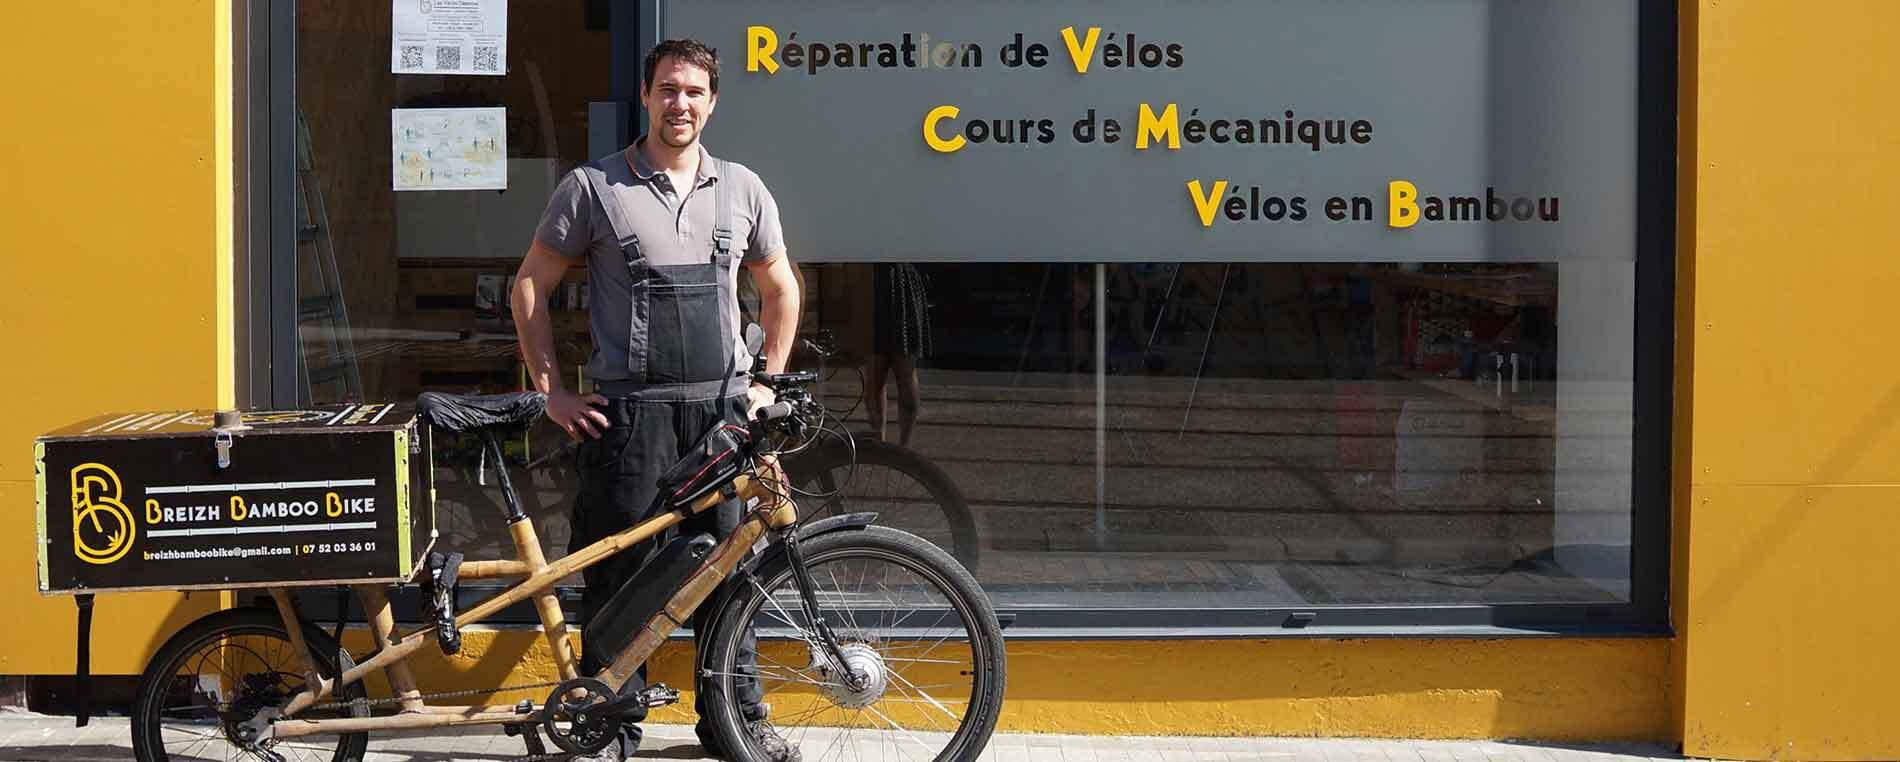 Breizh Bamboo Bike à Brest